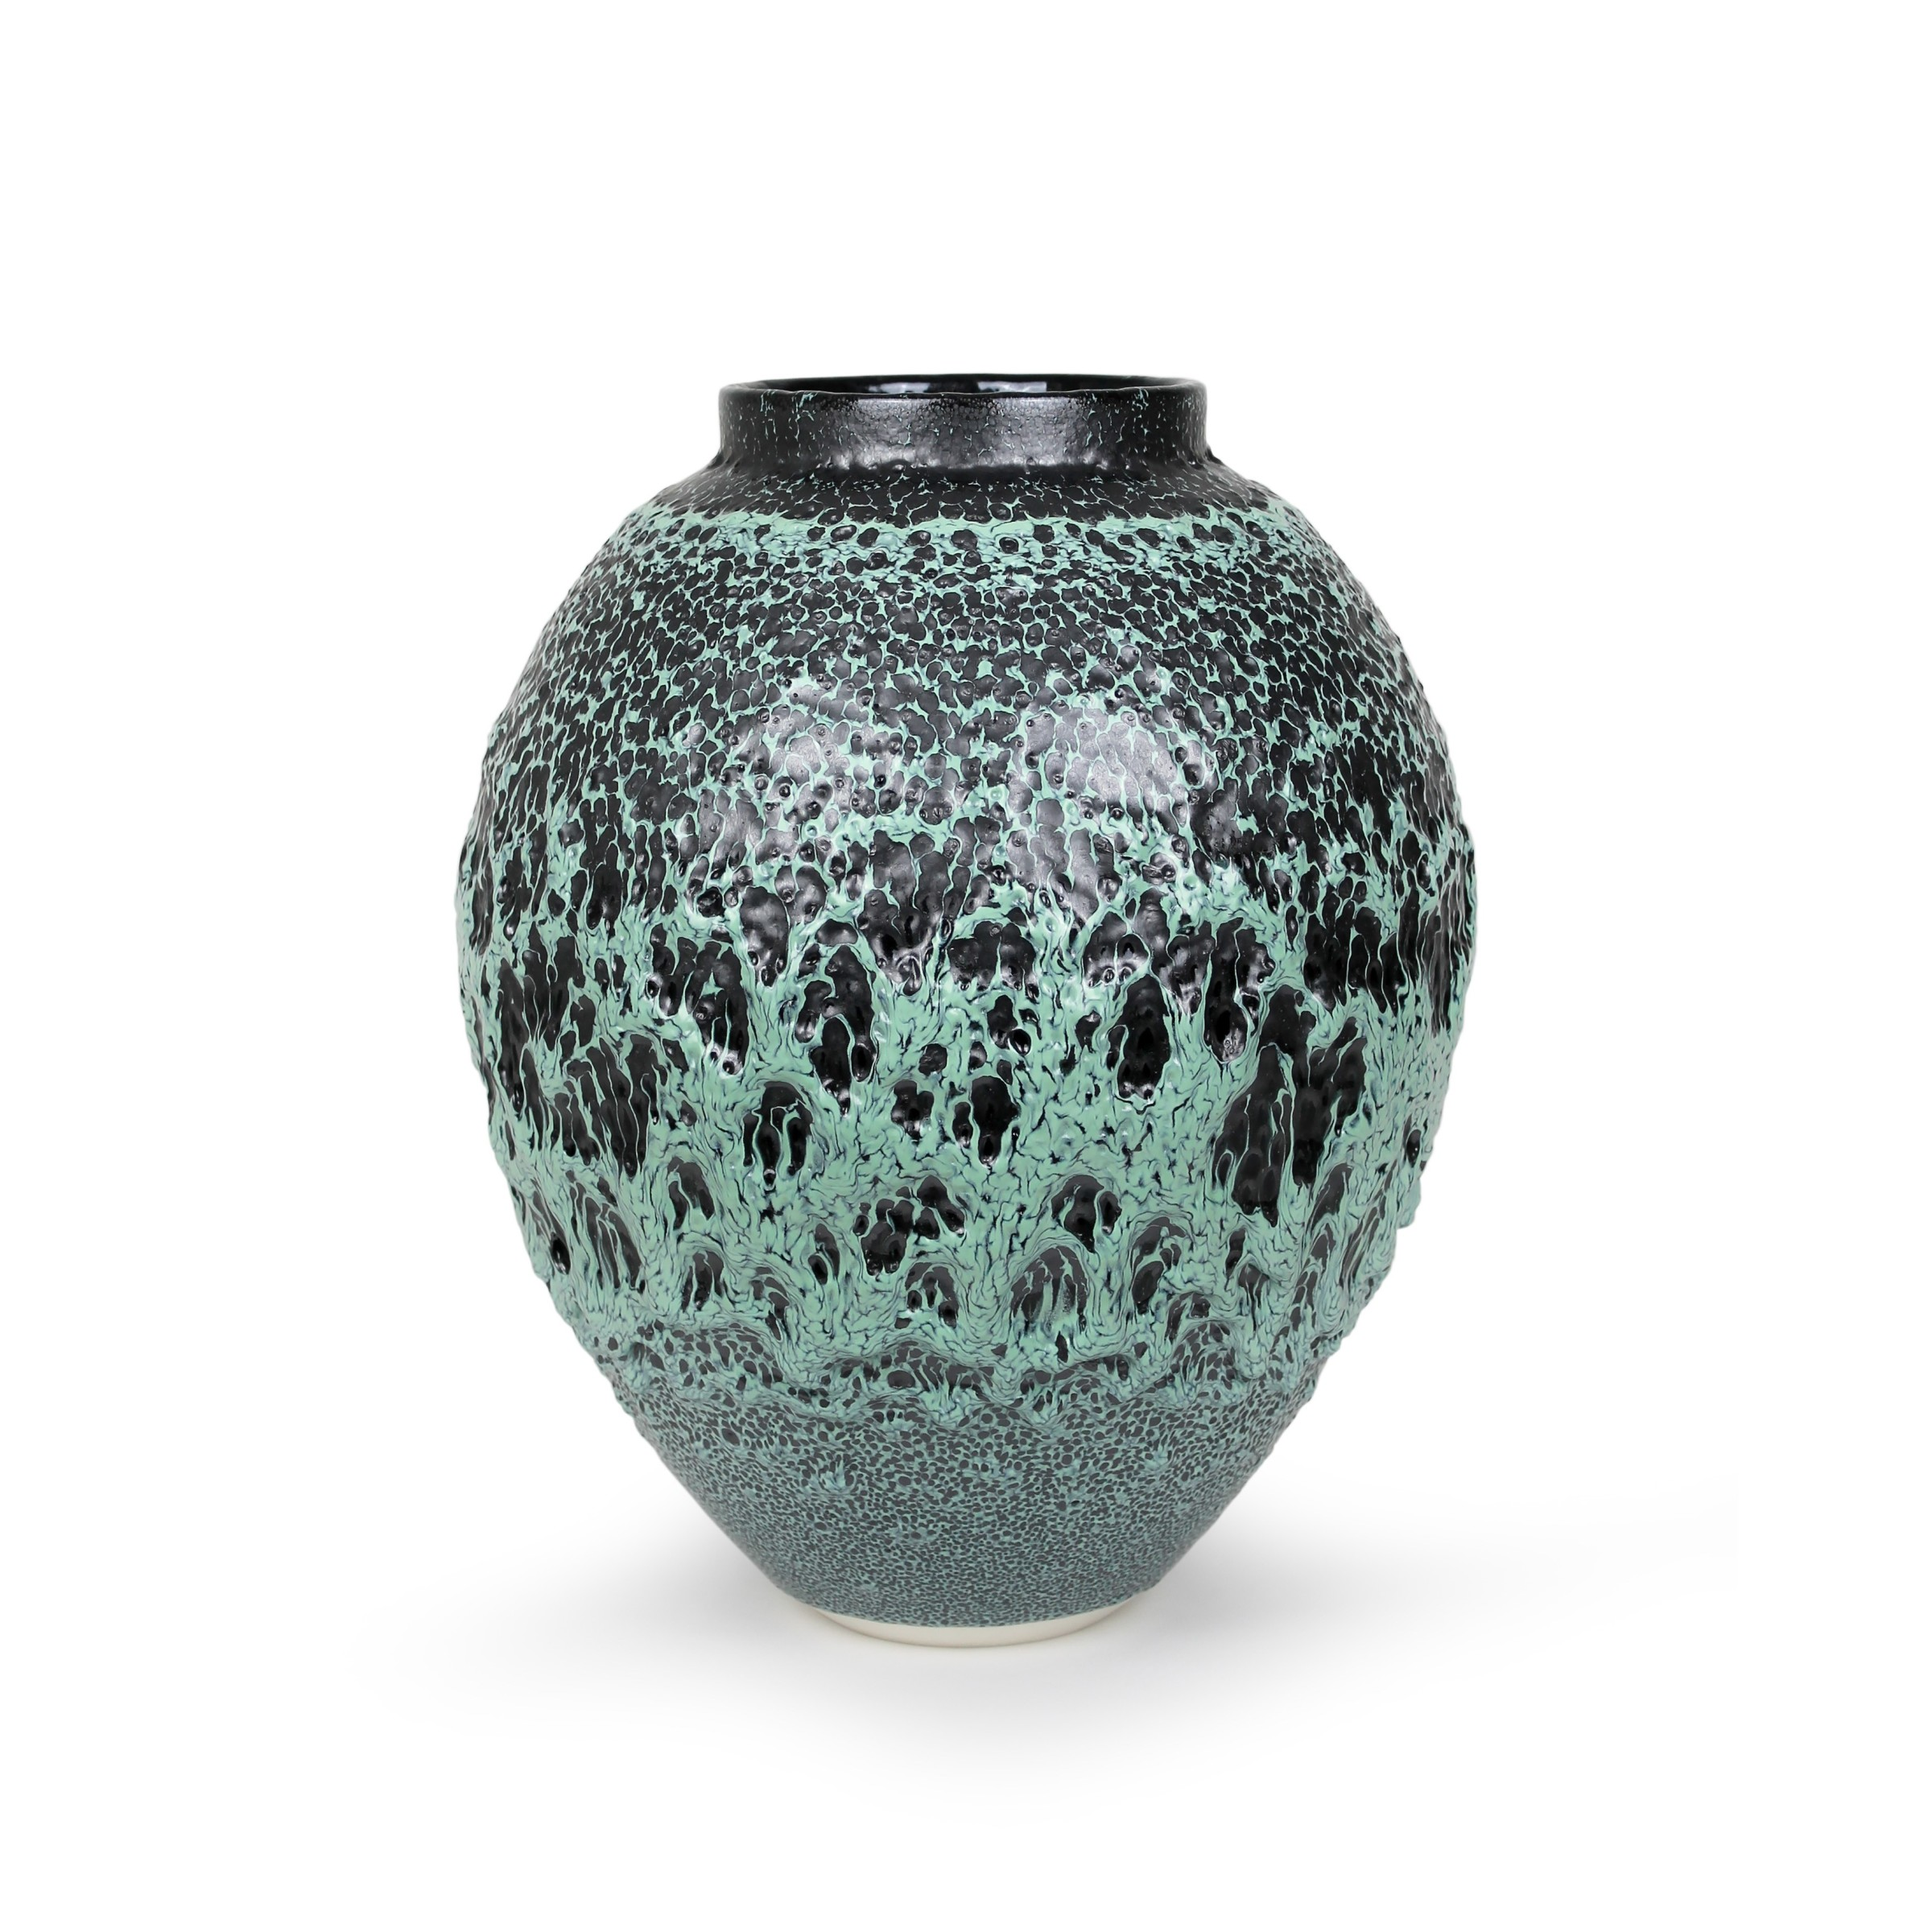 "<span class=""link fancybox-details-link""><a href=""/exhibitions/45/works/artworks3347/"">View Detail Page</a></span><div class=""artist""><strong>Albert Montserrat</strong></div><div class=""title""><em>Green Urani Vessel</em>, 2020</div><div class=""medium"">Oil - Spot Glazed Thrown Porcelain</div><div class=""dimensions"">43 x 35 x 35 cm<br>16 7/8 x 13 3/4 x 13 3/4 in.</div>"